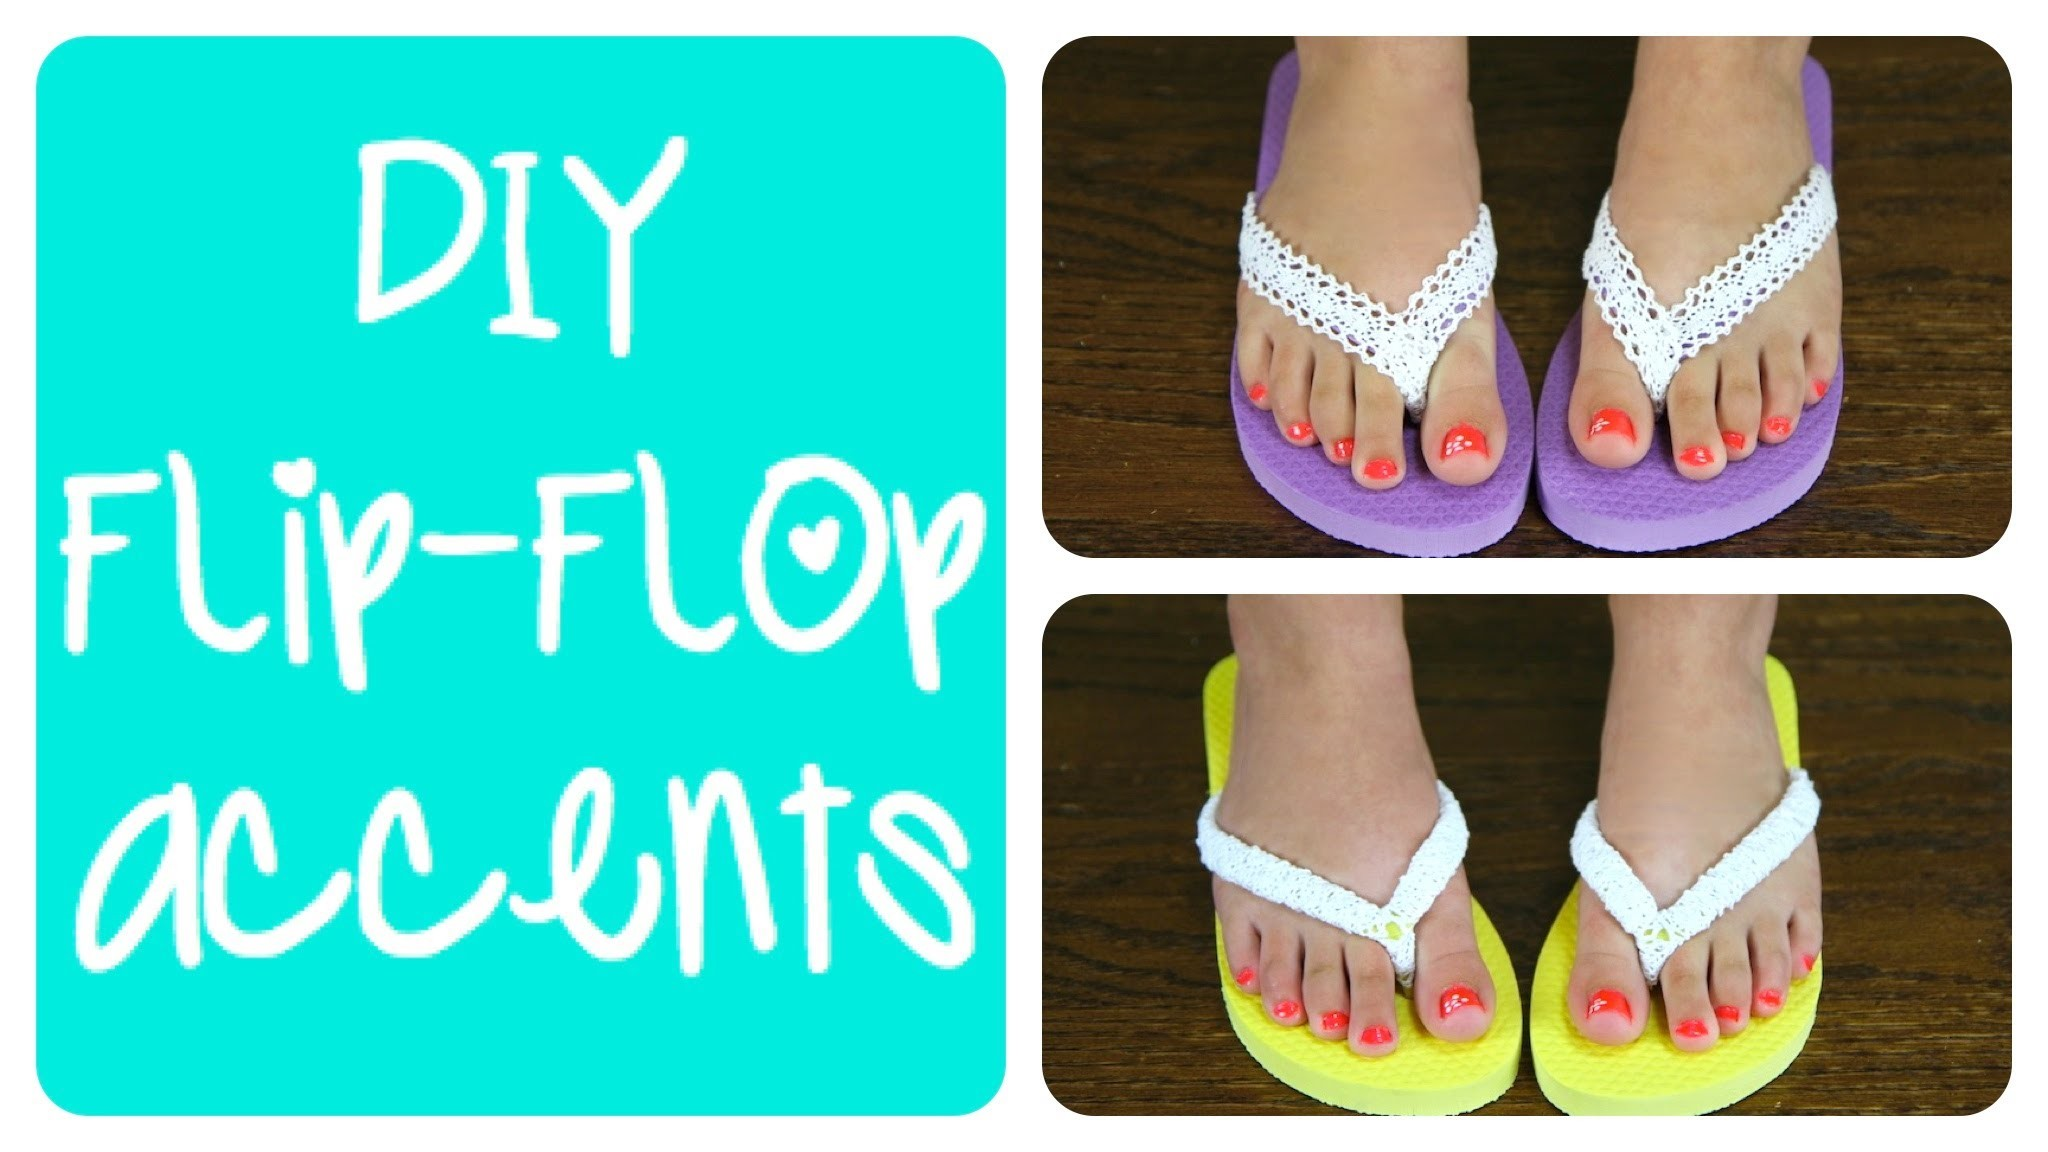 DIY Flip-Flop Accents | Brooklyn and Bailey